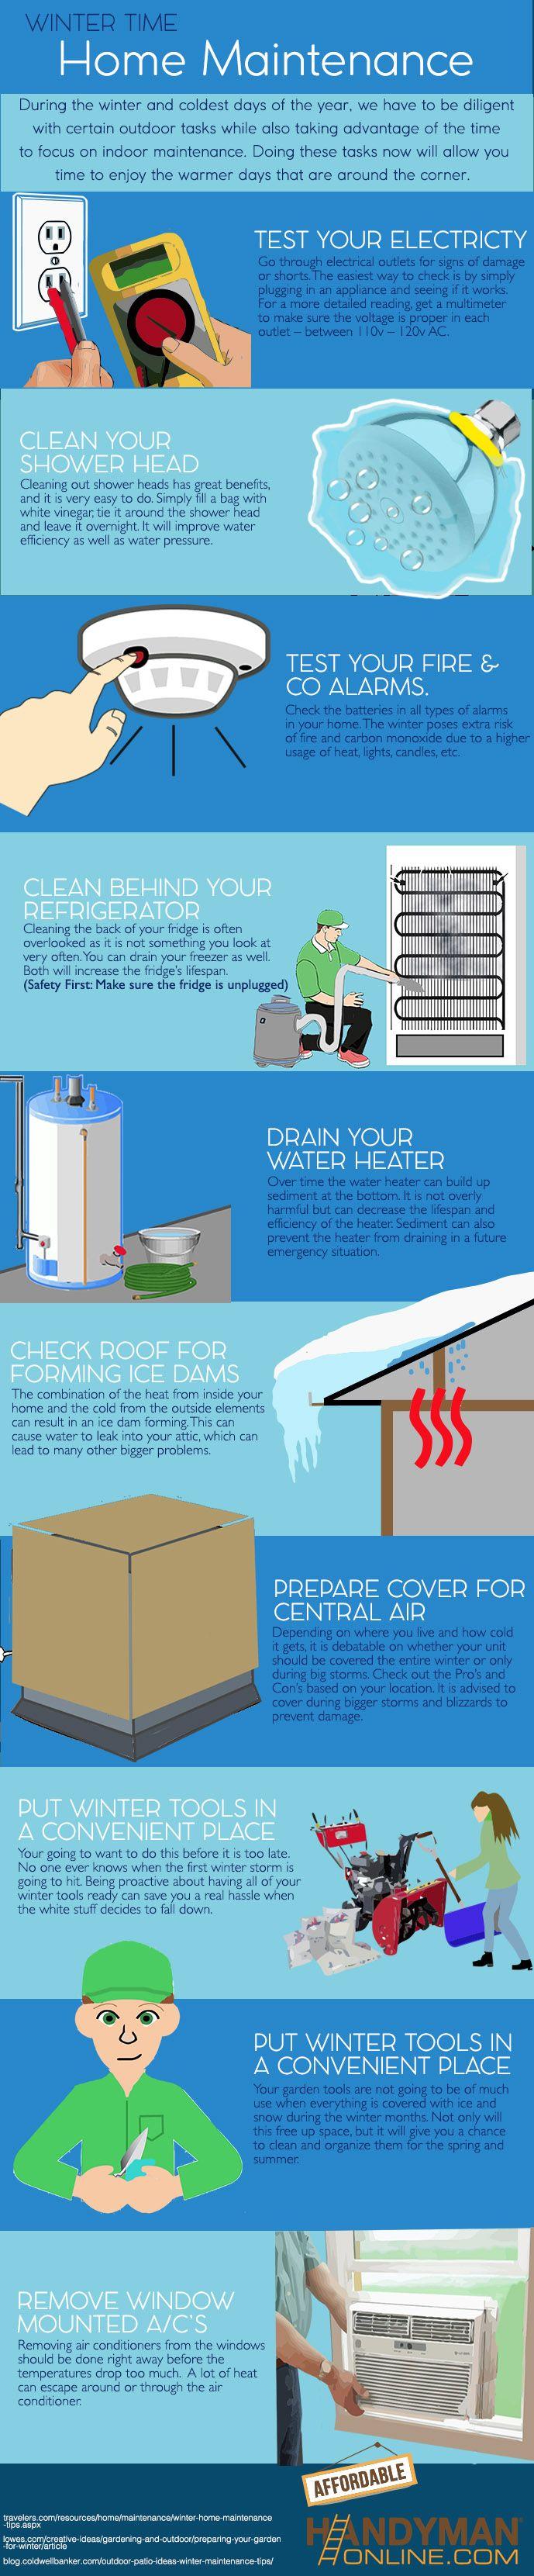 winter home maintenance checklist Home maintenance, Home